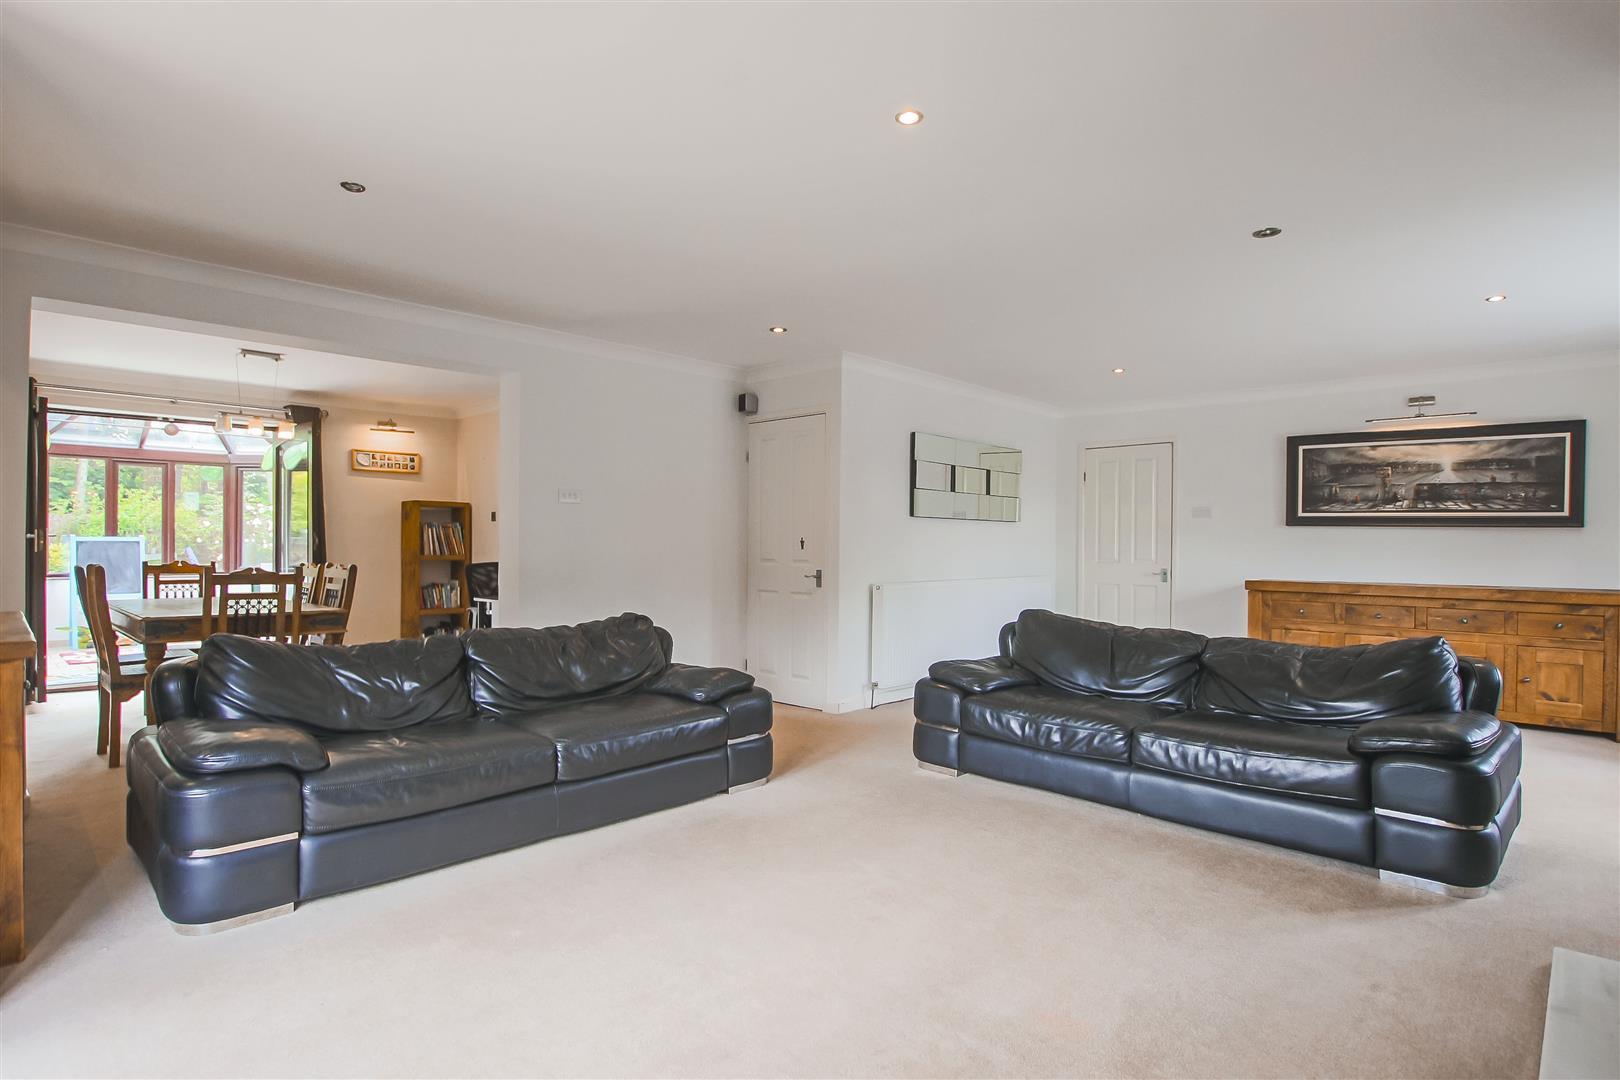 5 Bedroom Detached House For Sale - Image 28